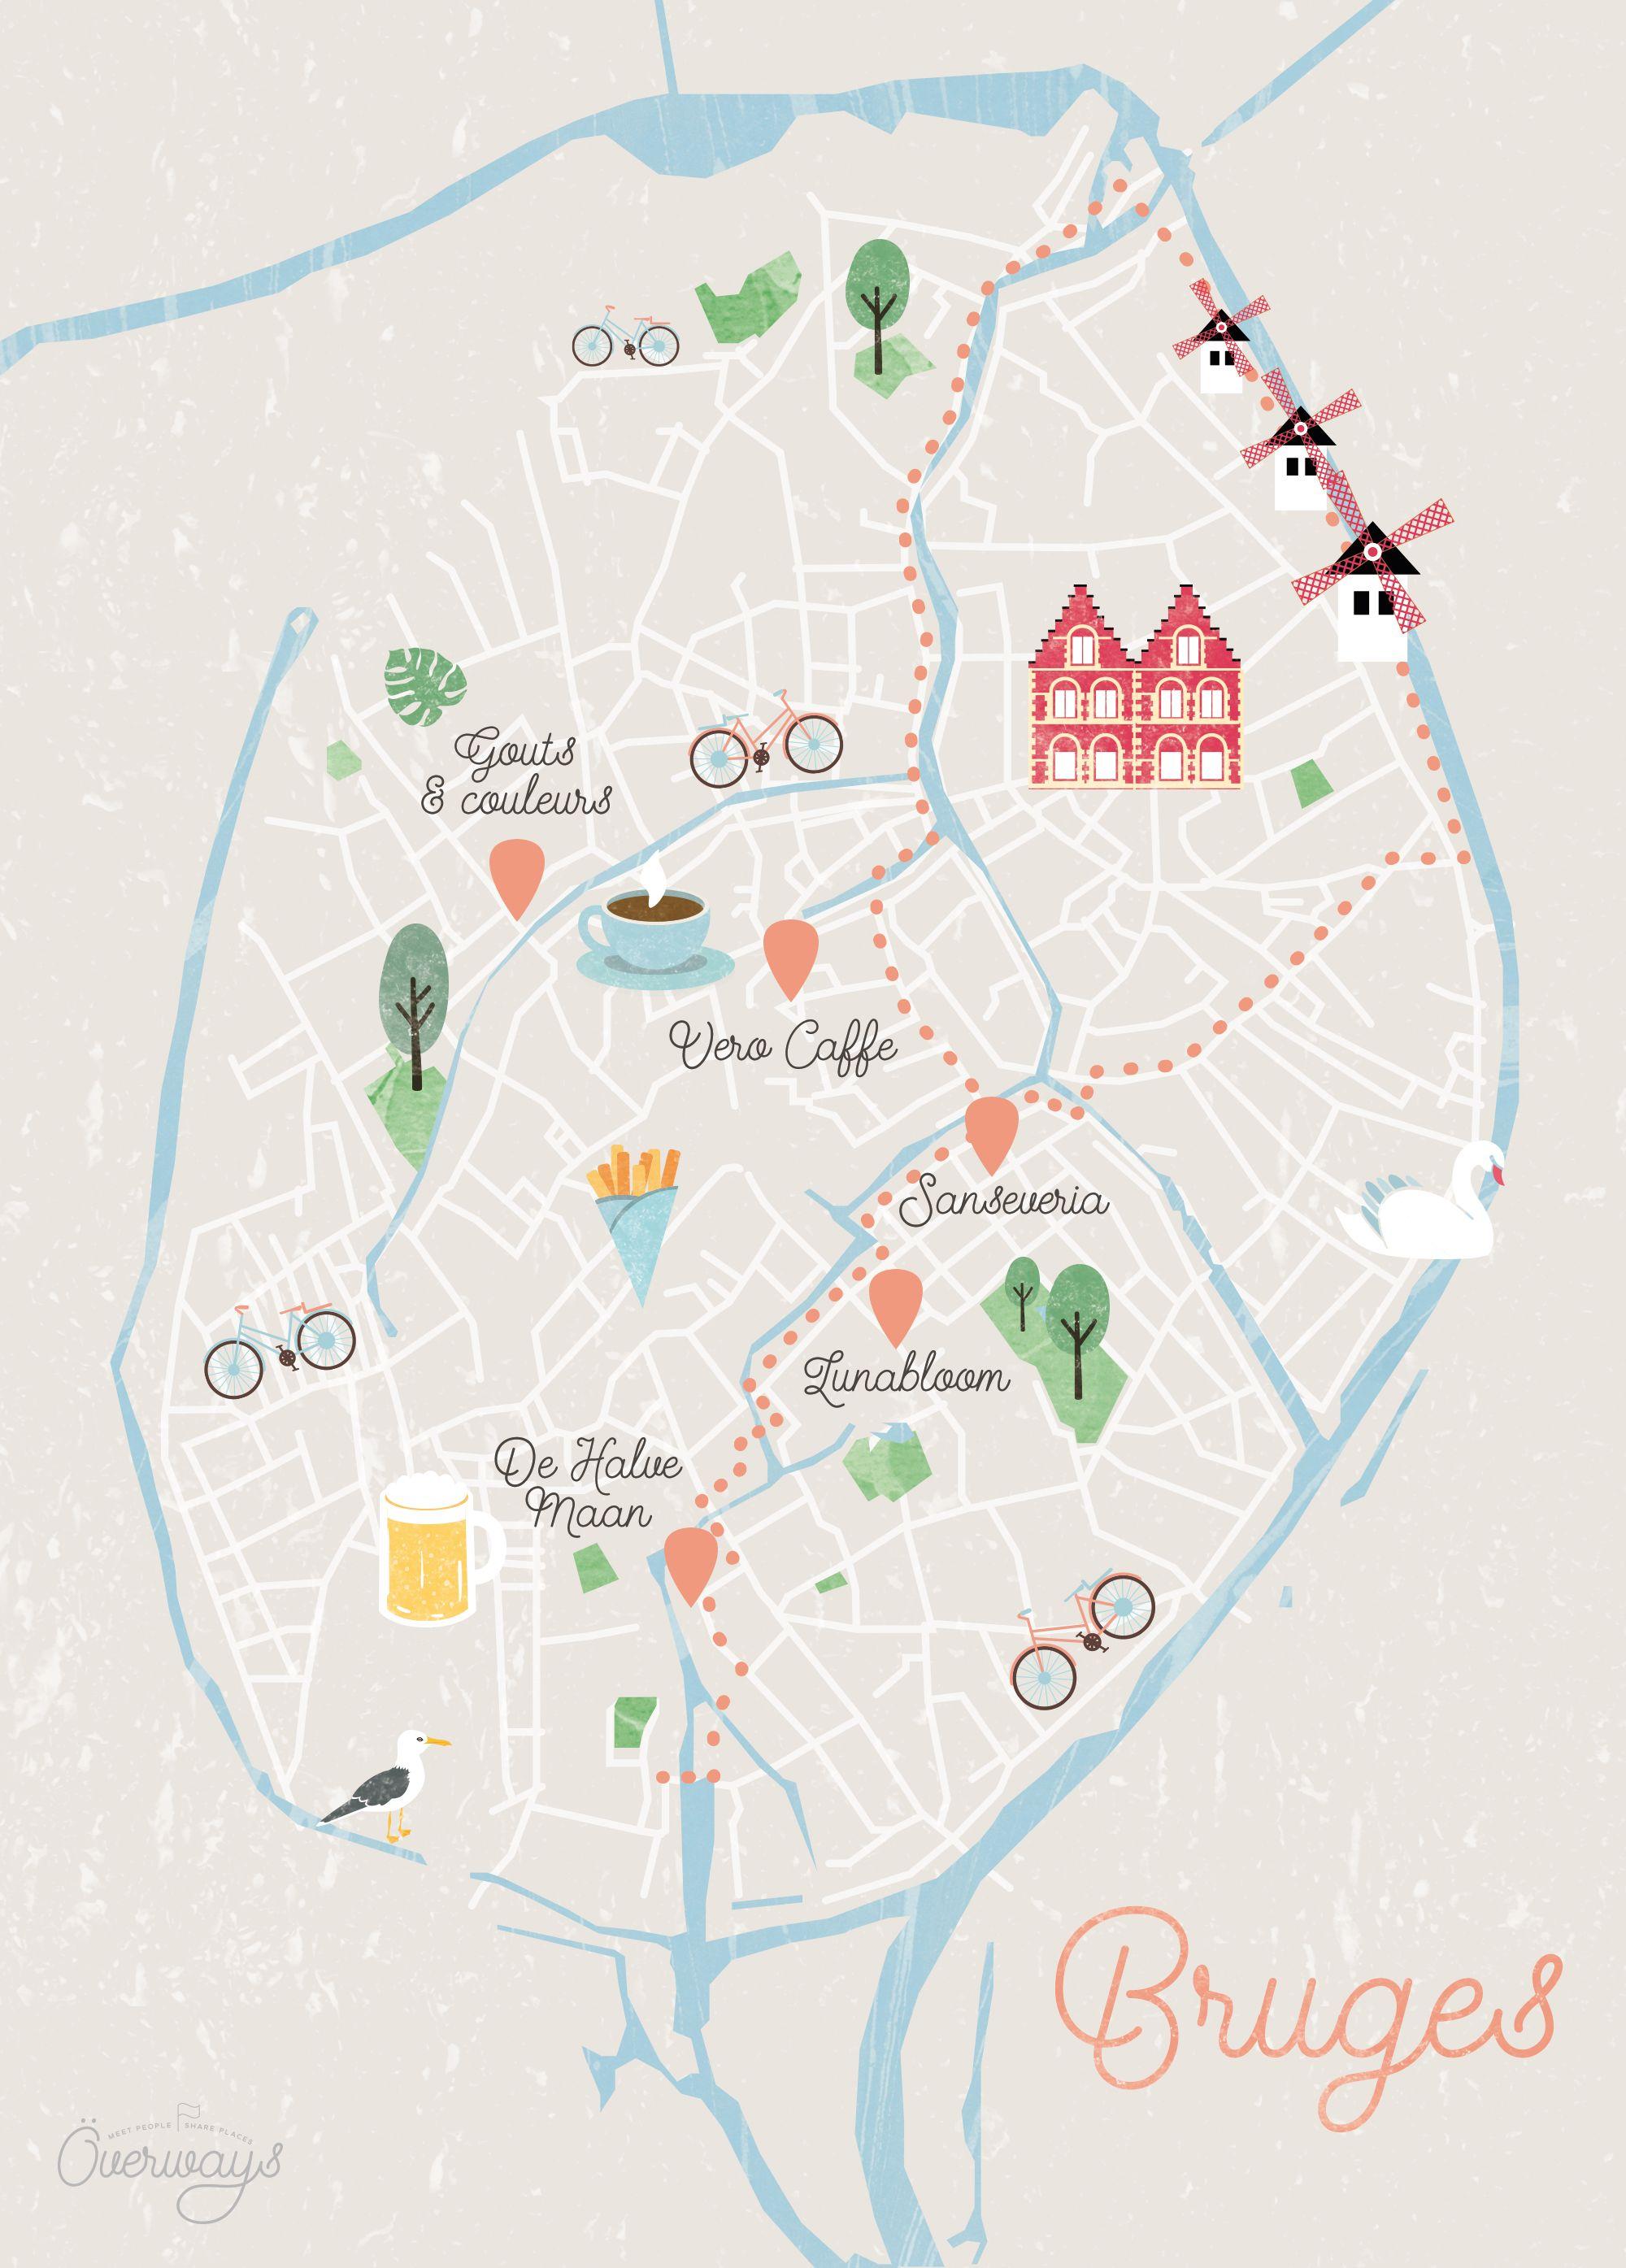 Carte De Bruges Illustree